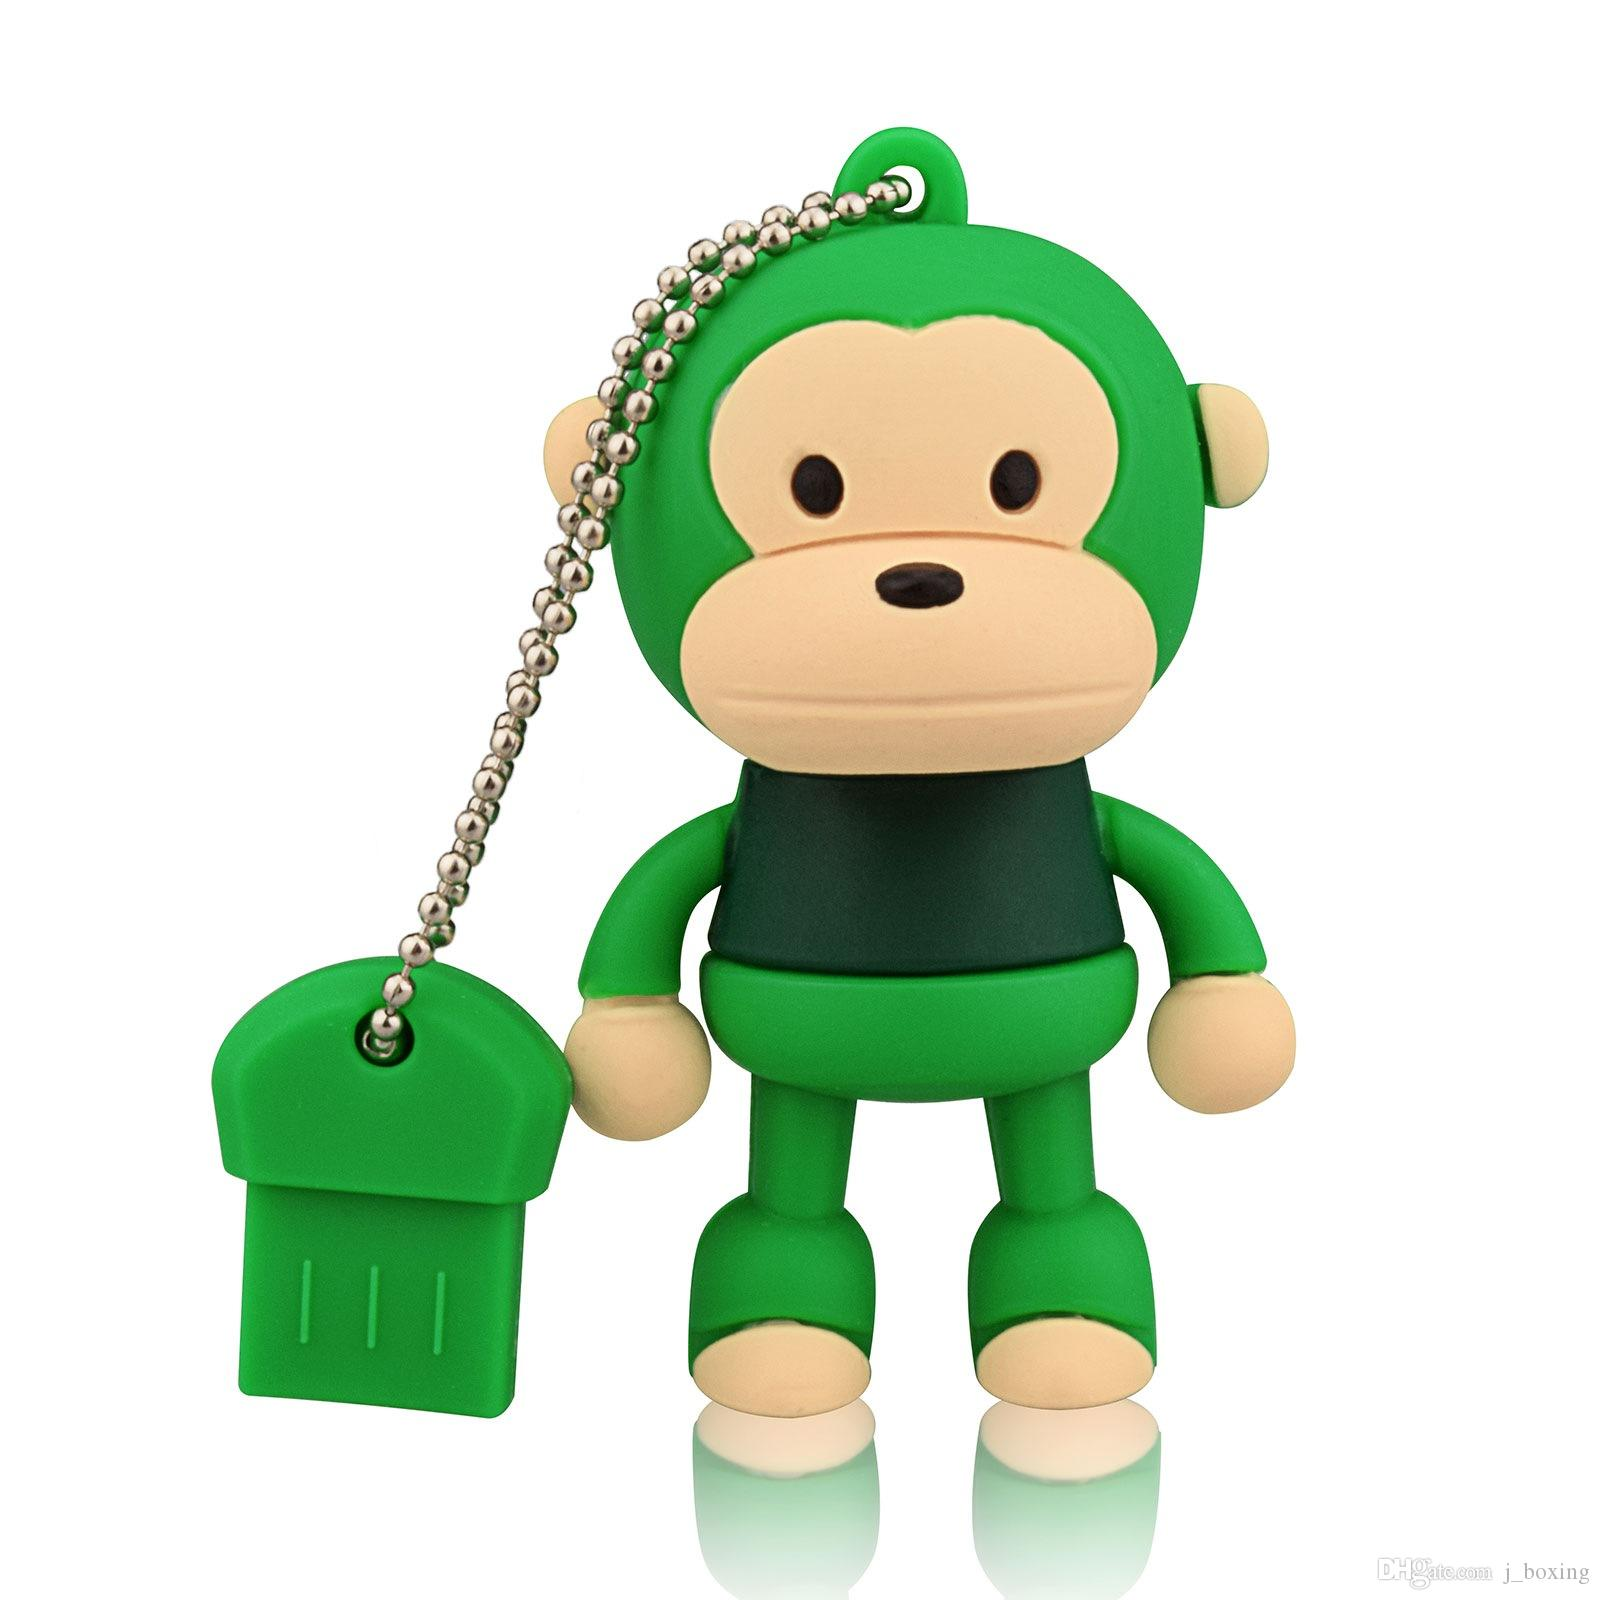 Green Cartoon Monkey Design 8GB 16GB 32GB 64GB USB Flash Drives Thumb Pen Drives USB 2.0 Memory Stick for Computer Laptop Tablet Pen Storage